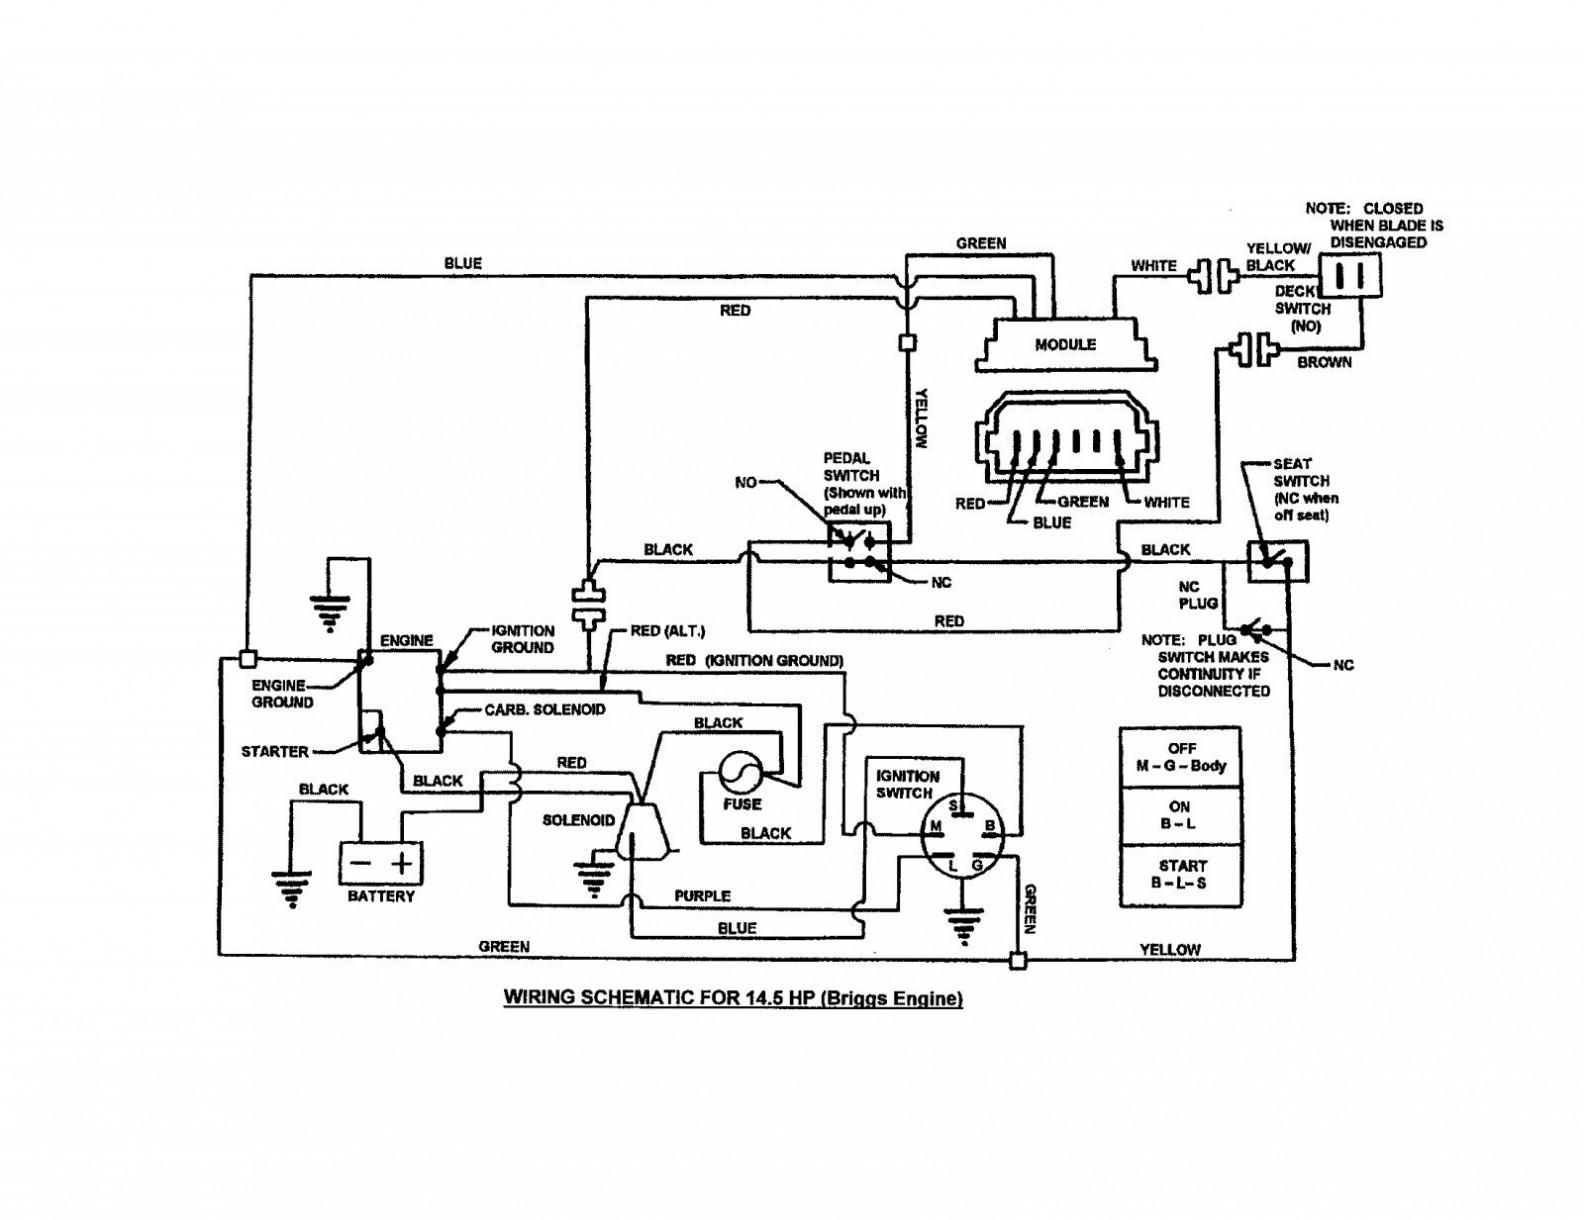 install briggs magneto wiring diagrams toyskids co Ford Ignition Wiring Diagram wrg 8908 briggs magneto wiring diagrams ignition switch wiring diagram points ignition wiring diagram